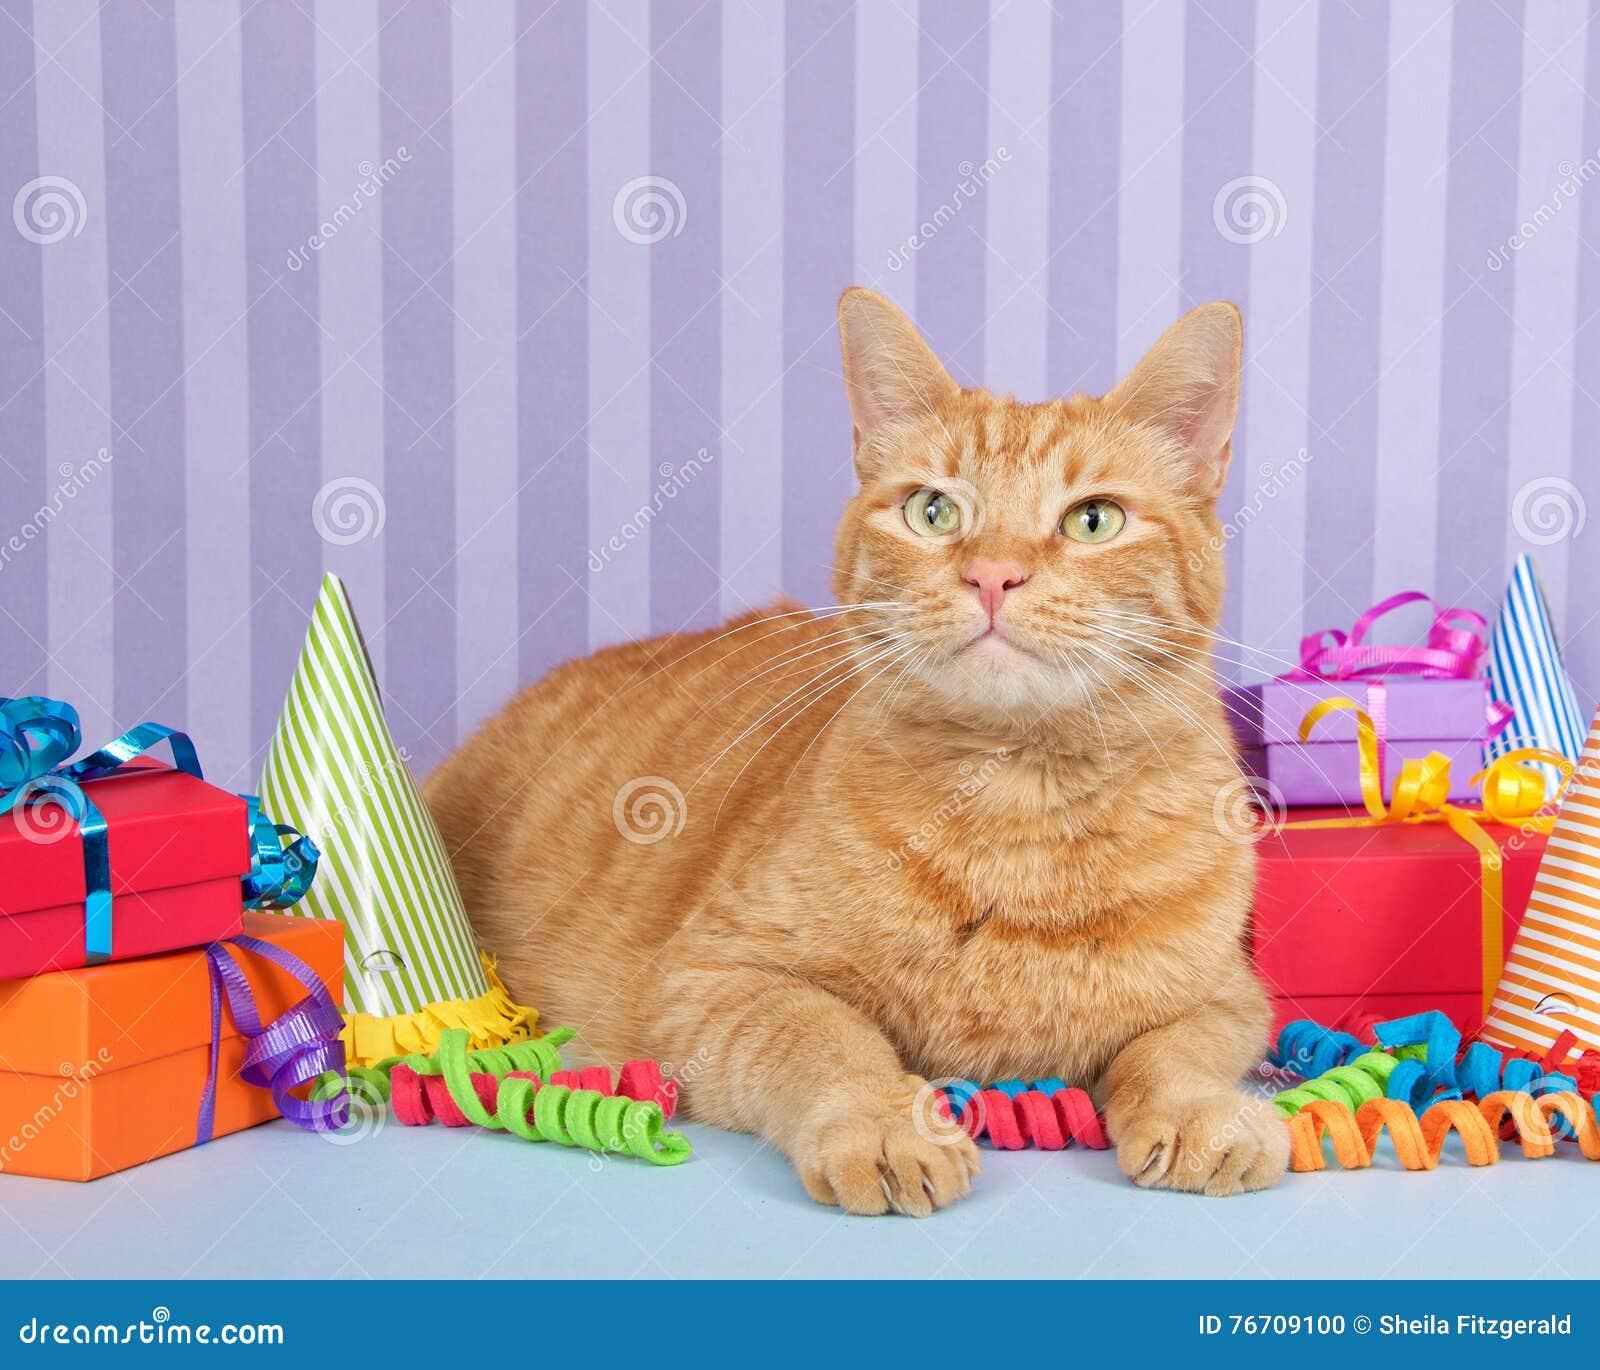 Birthday Orange Cat: Orange Ginger Tabby Cat Sitting With Birthday Presents